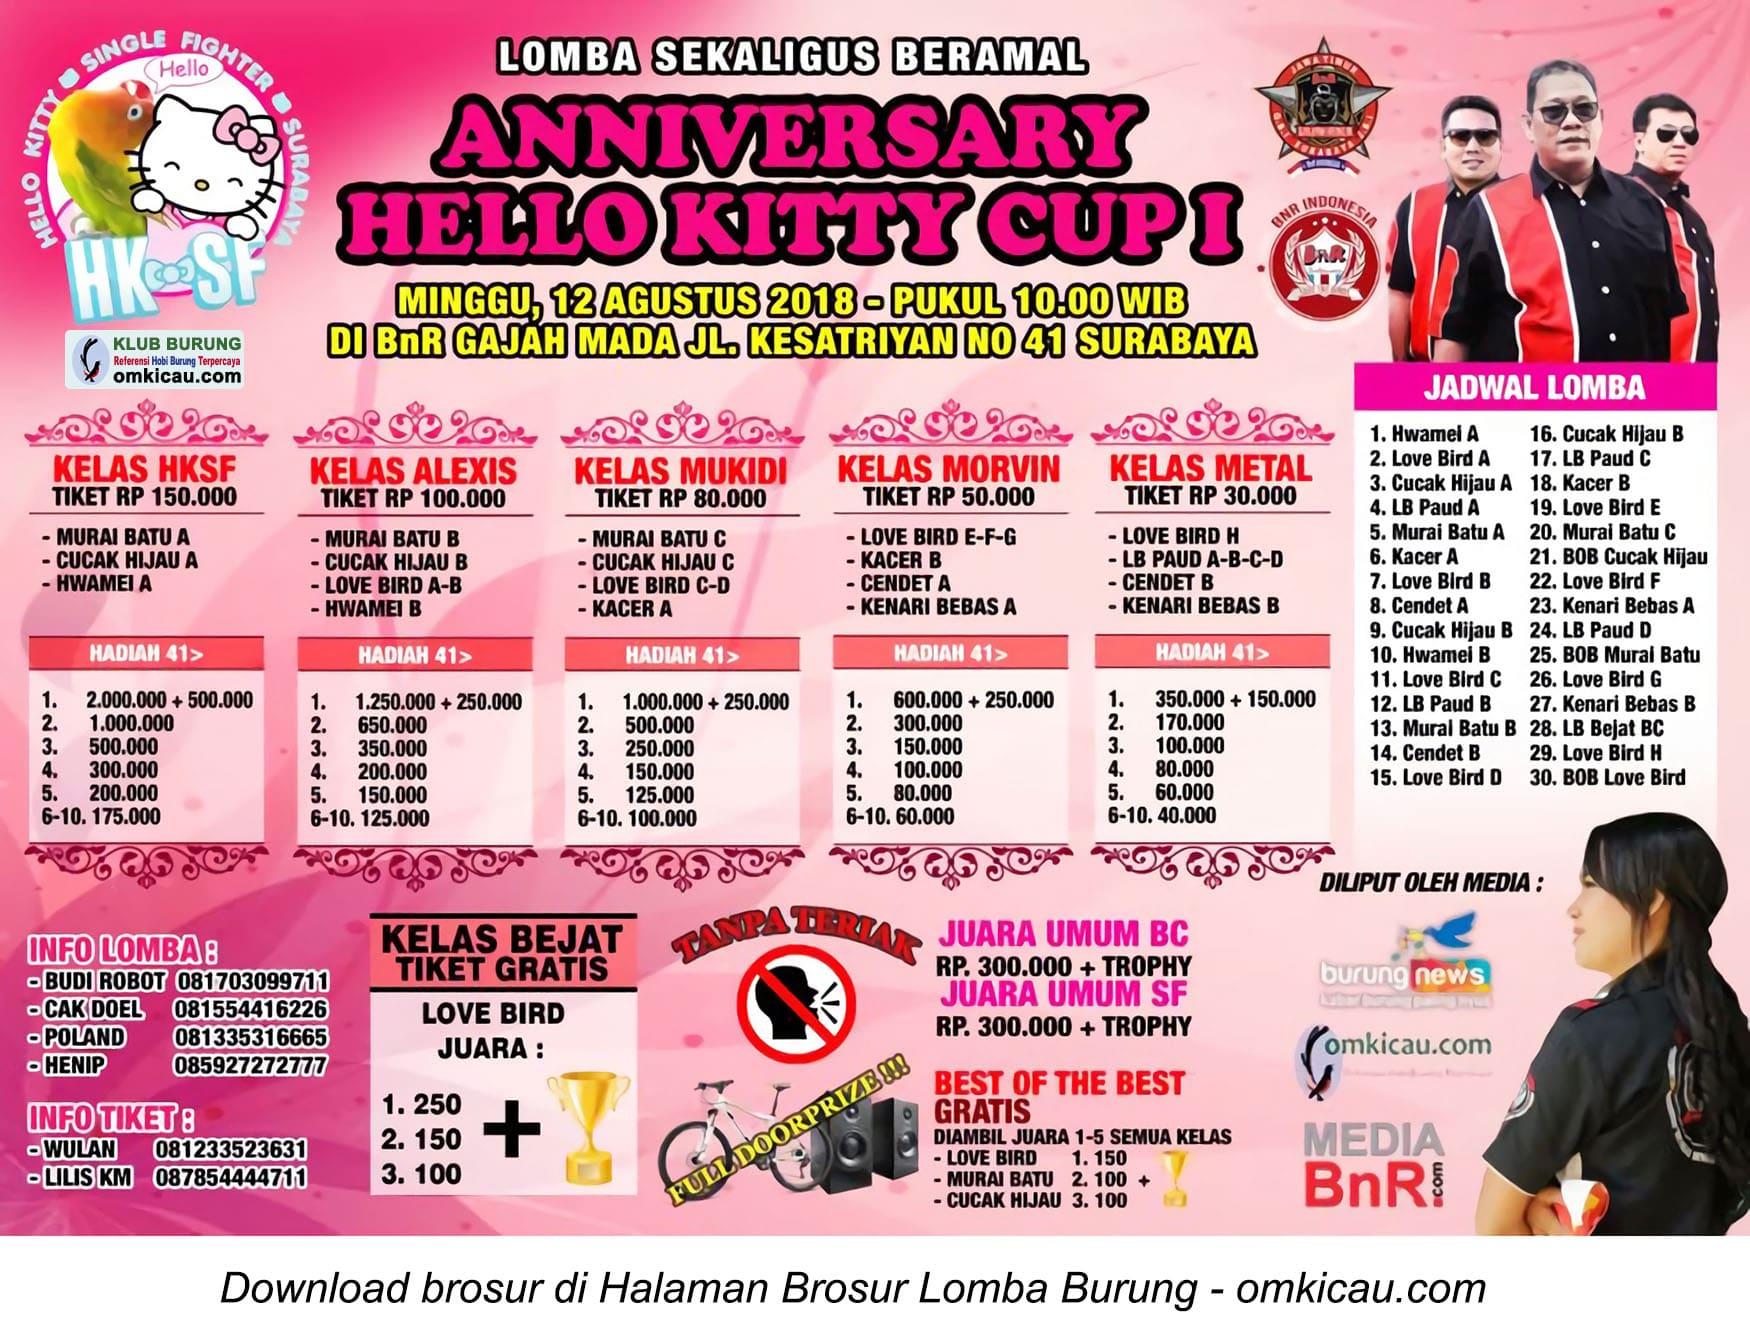 Anniversary Hello Kitty Cup I